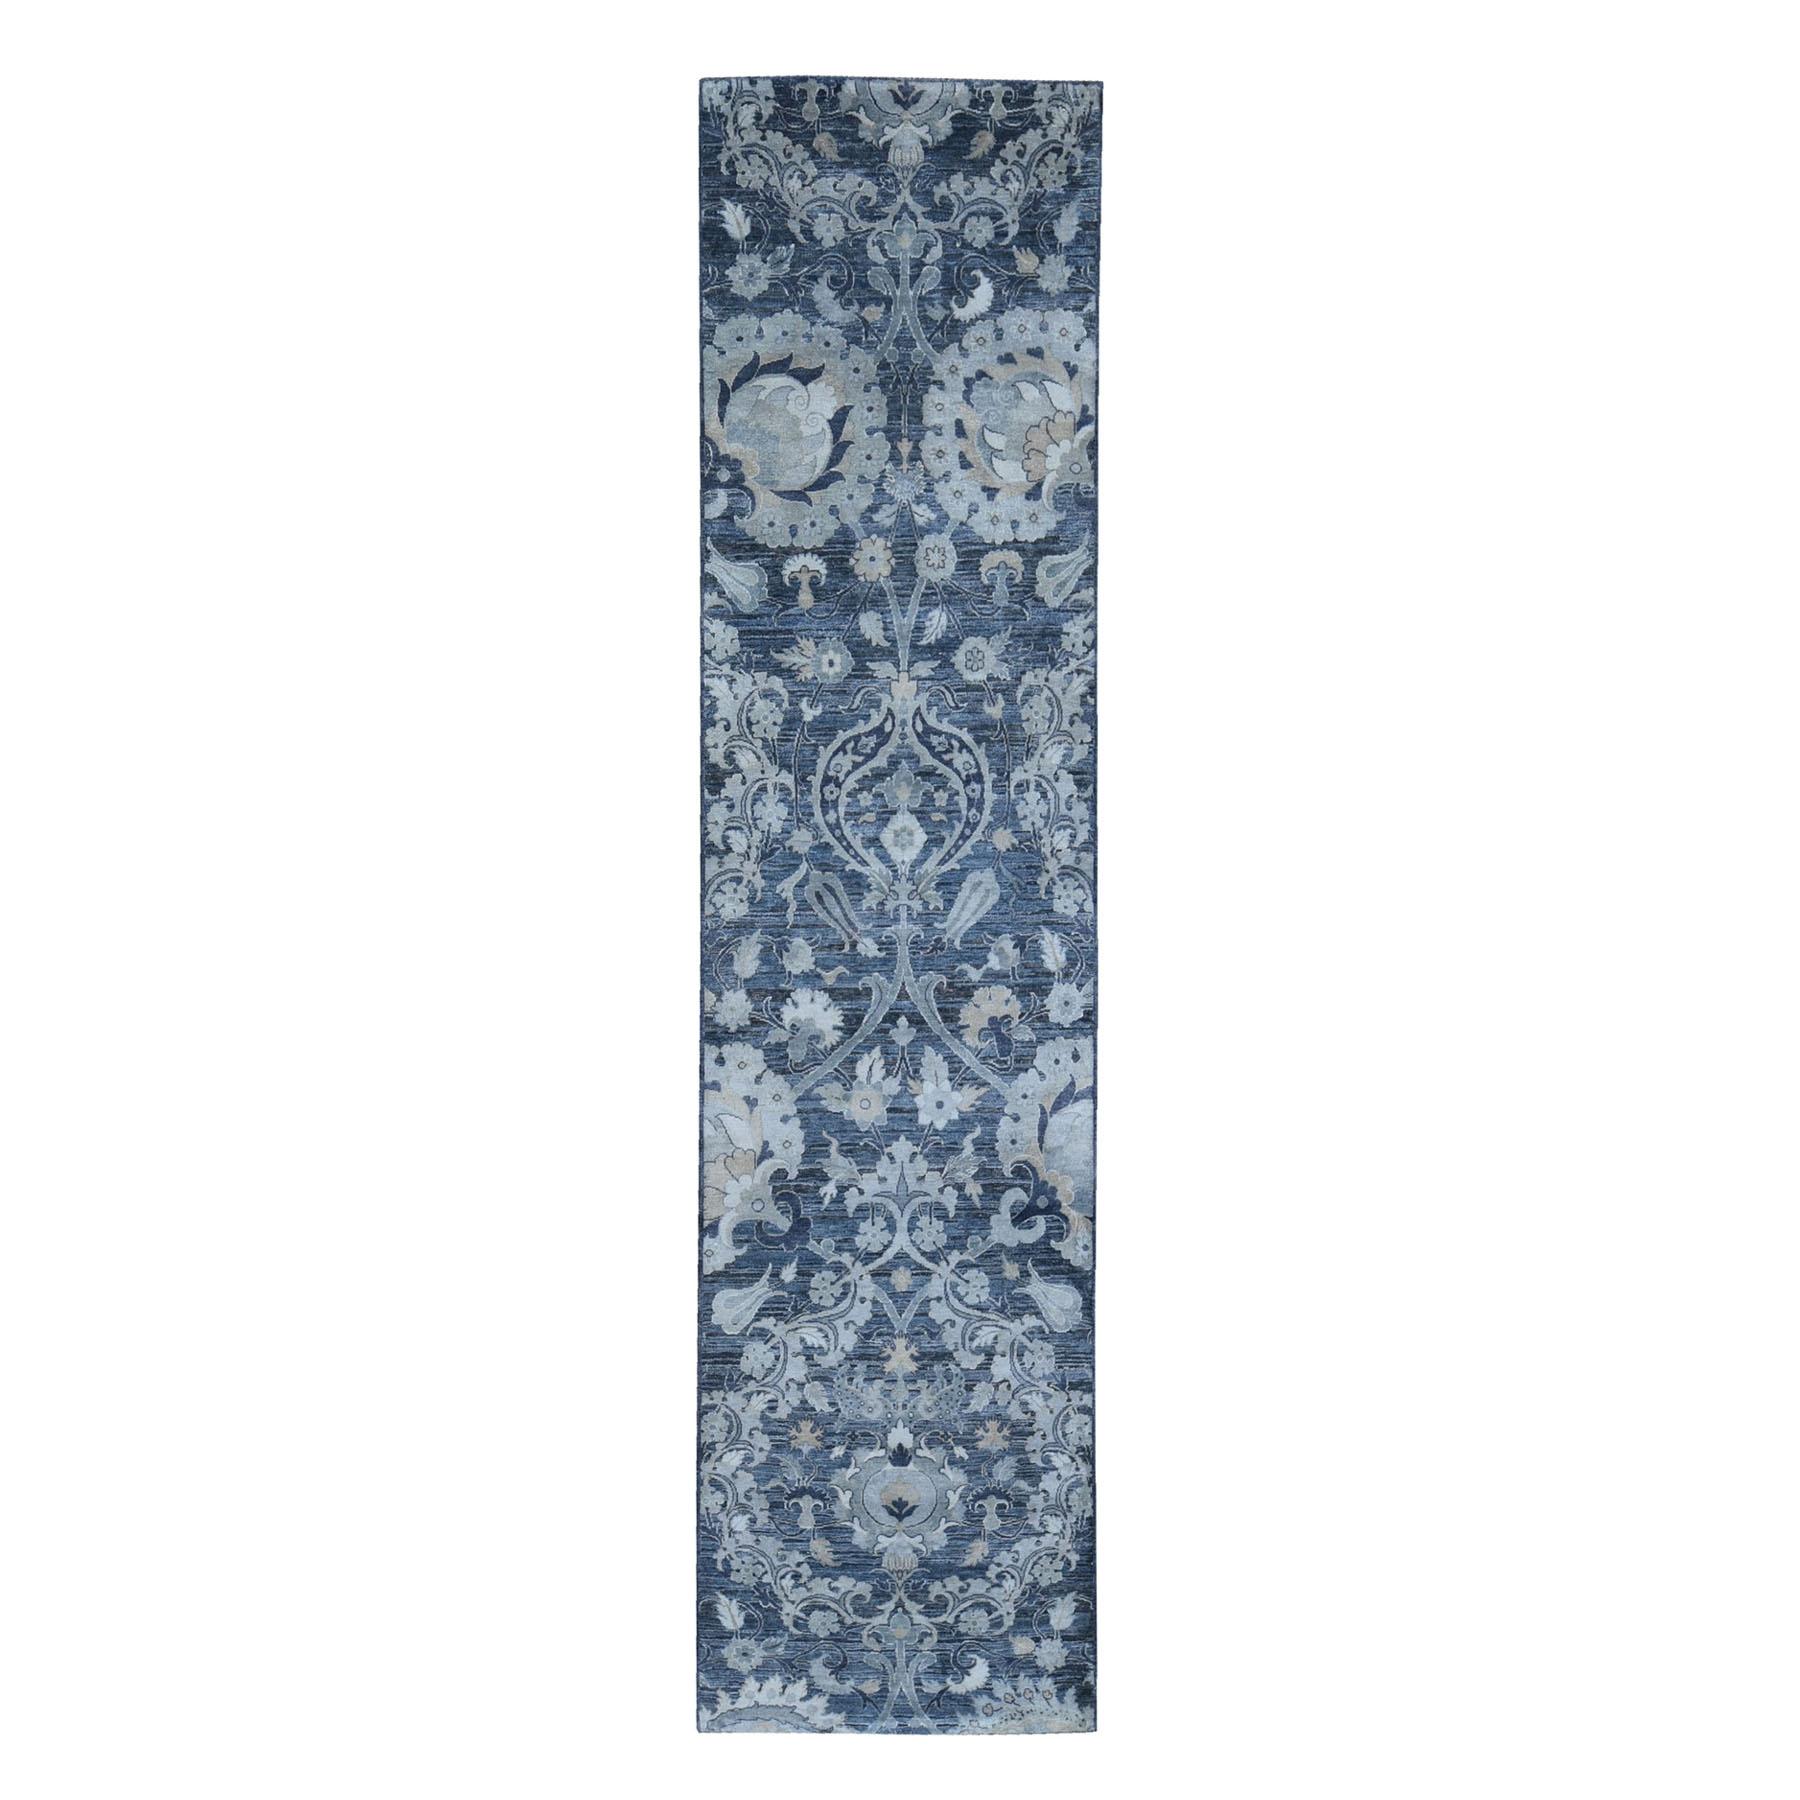 "3'x12'2"" Silk with Textured Wool Palmette Motif Design Hand Knotted Wide Runner Oriental Rug"